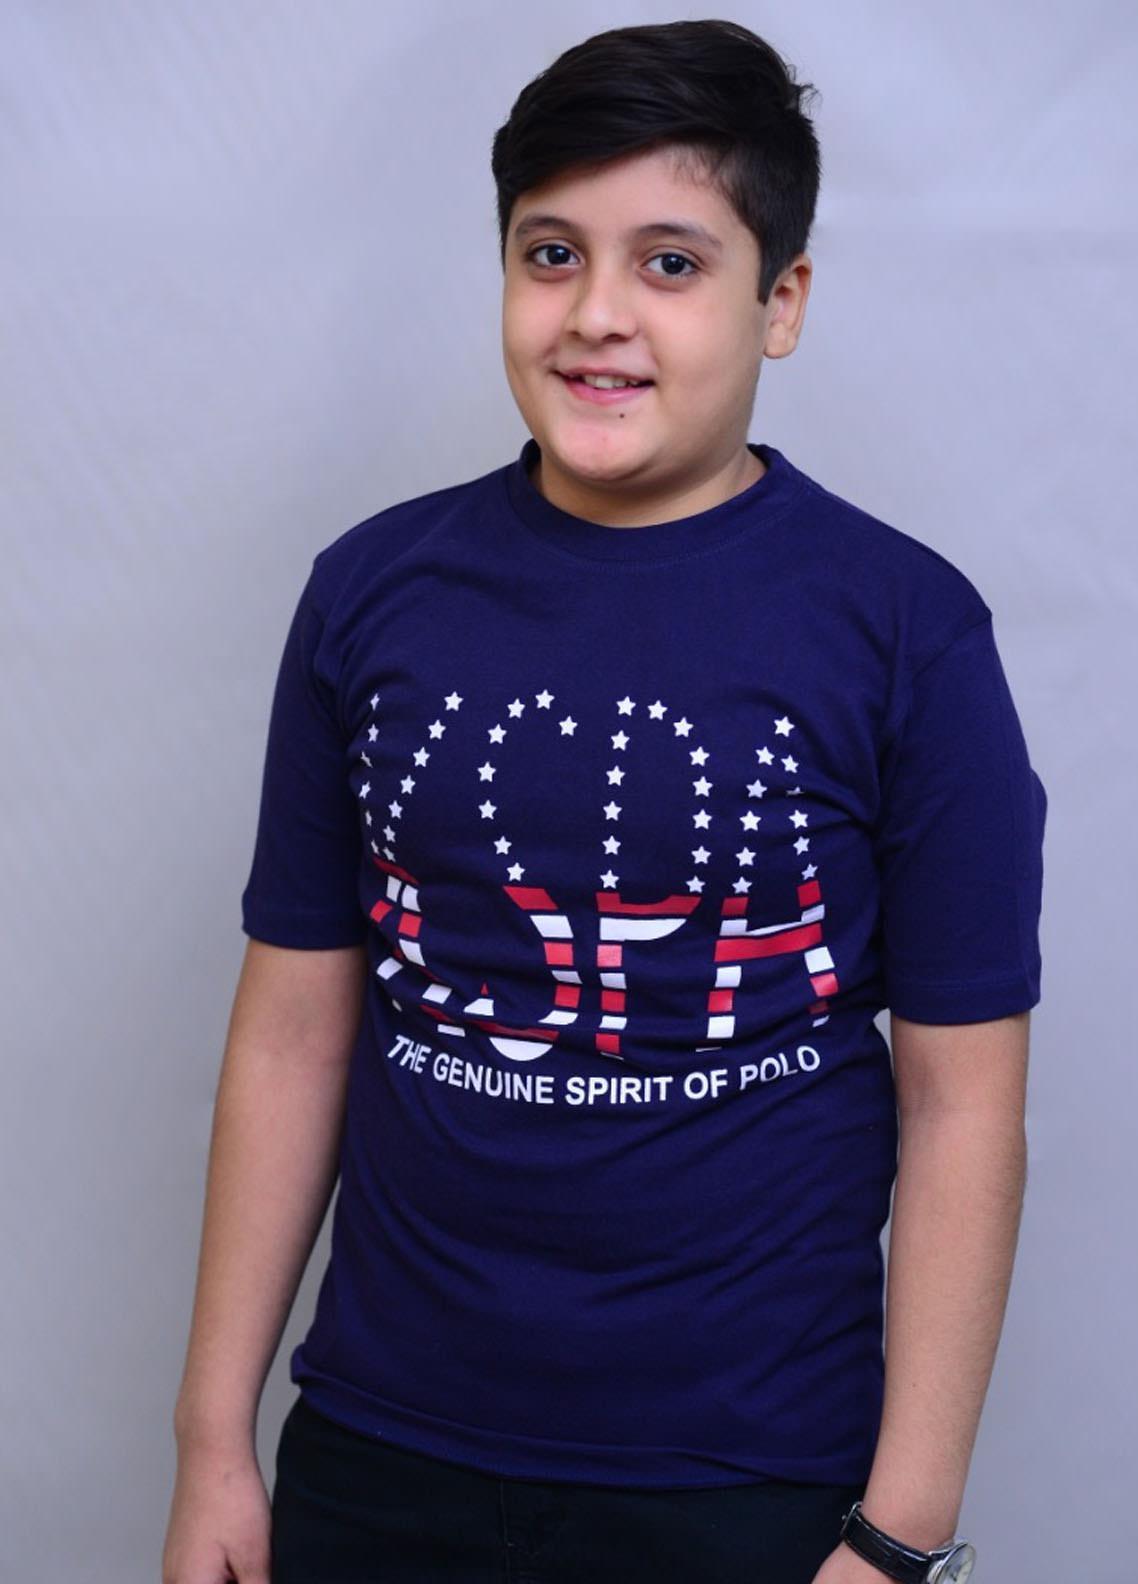 Kids Polo Jersey Casual Boys T-Shirts -  KP20BW BTHS 1909 NAVY Navy KSPA T-shirt